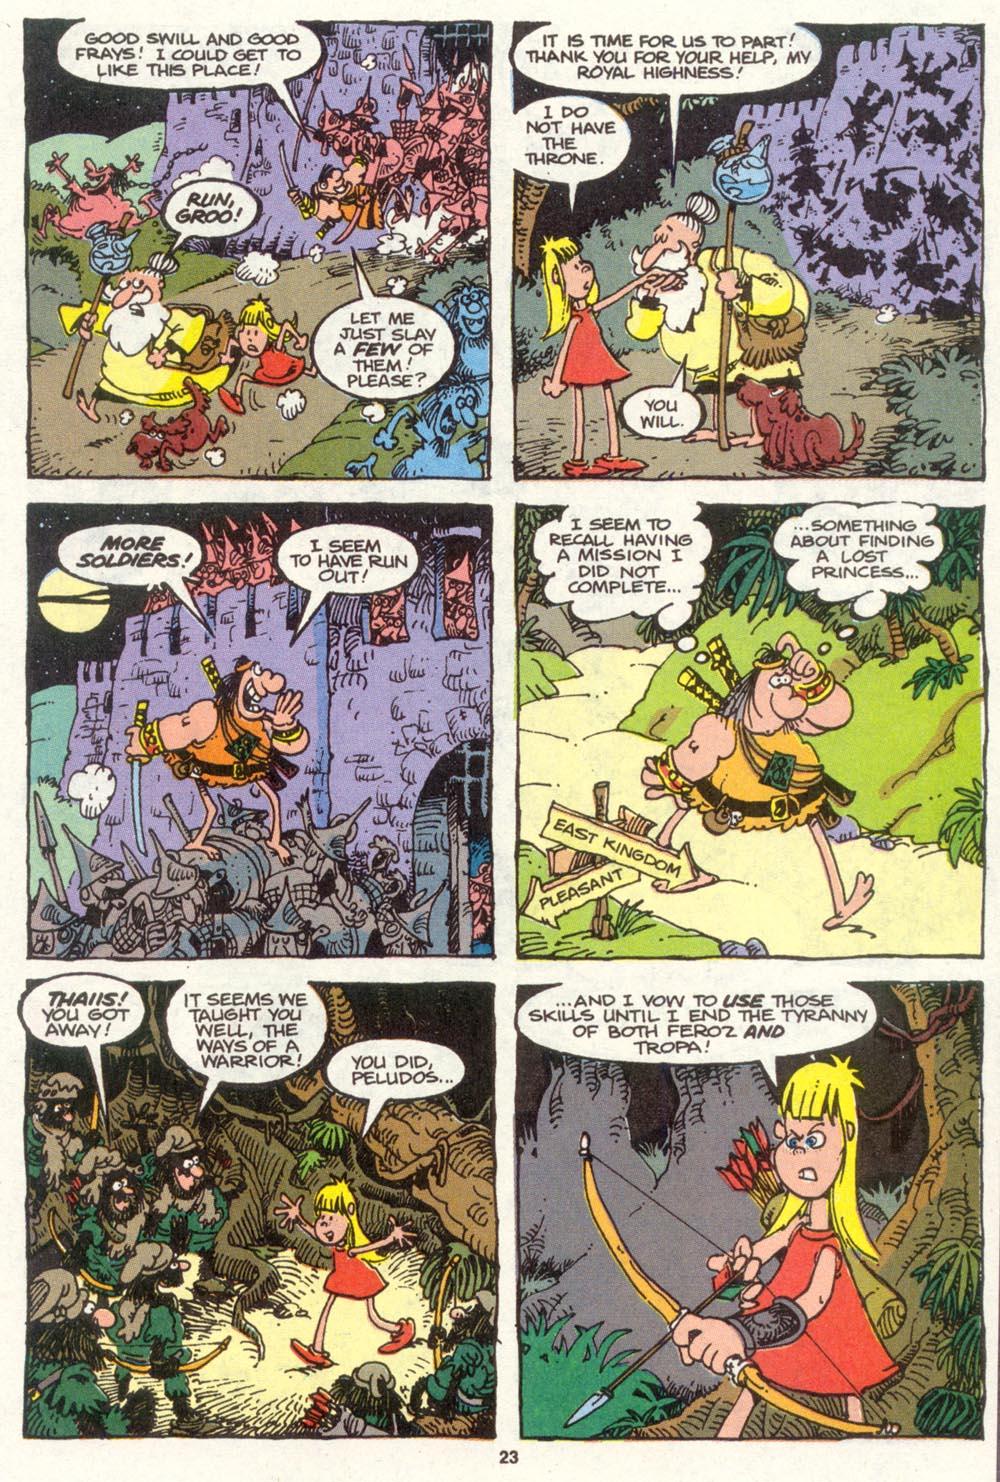 Read online Sergio Aragonés Groo the Wanderer comic -  Issue #83 - 17